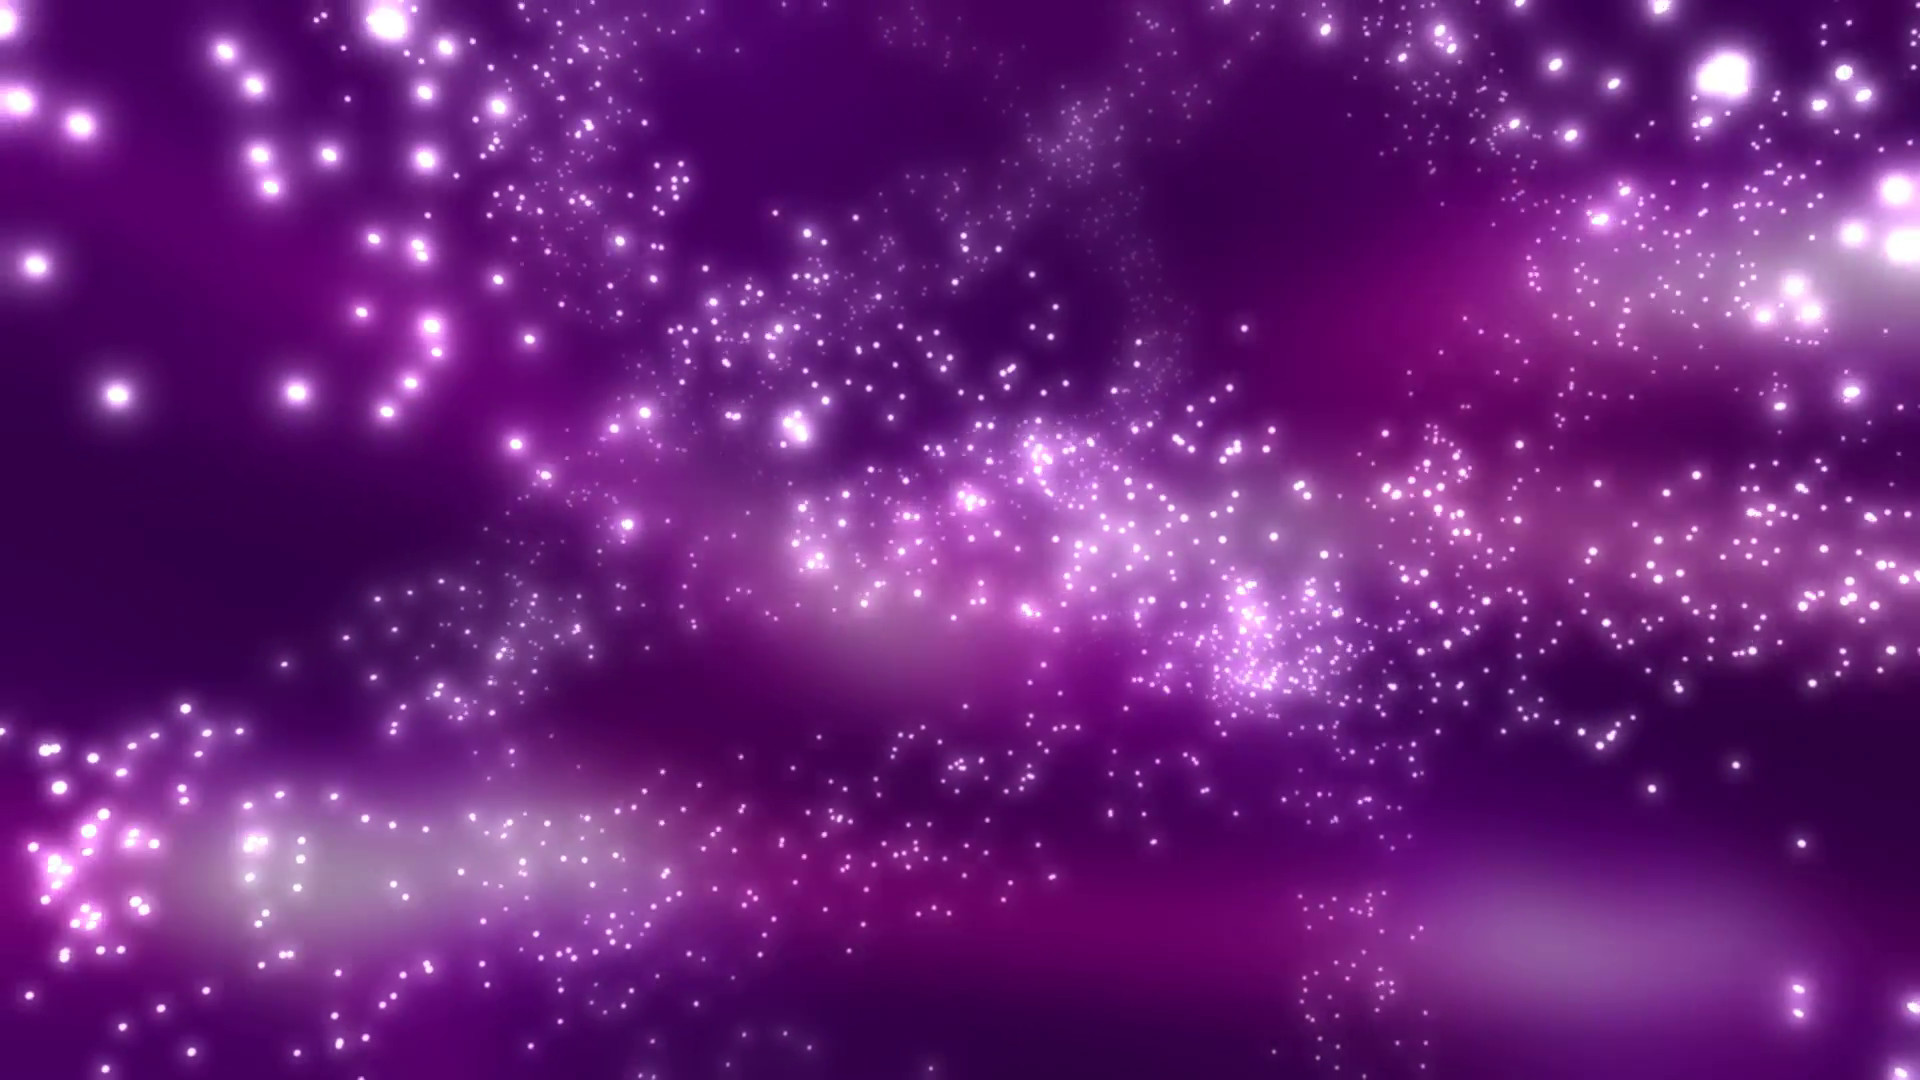 3d Wallpaper Lavender Purple Swirl Background 183 ①